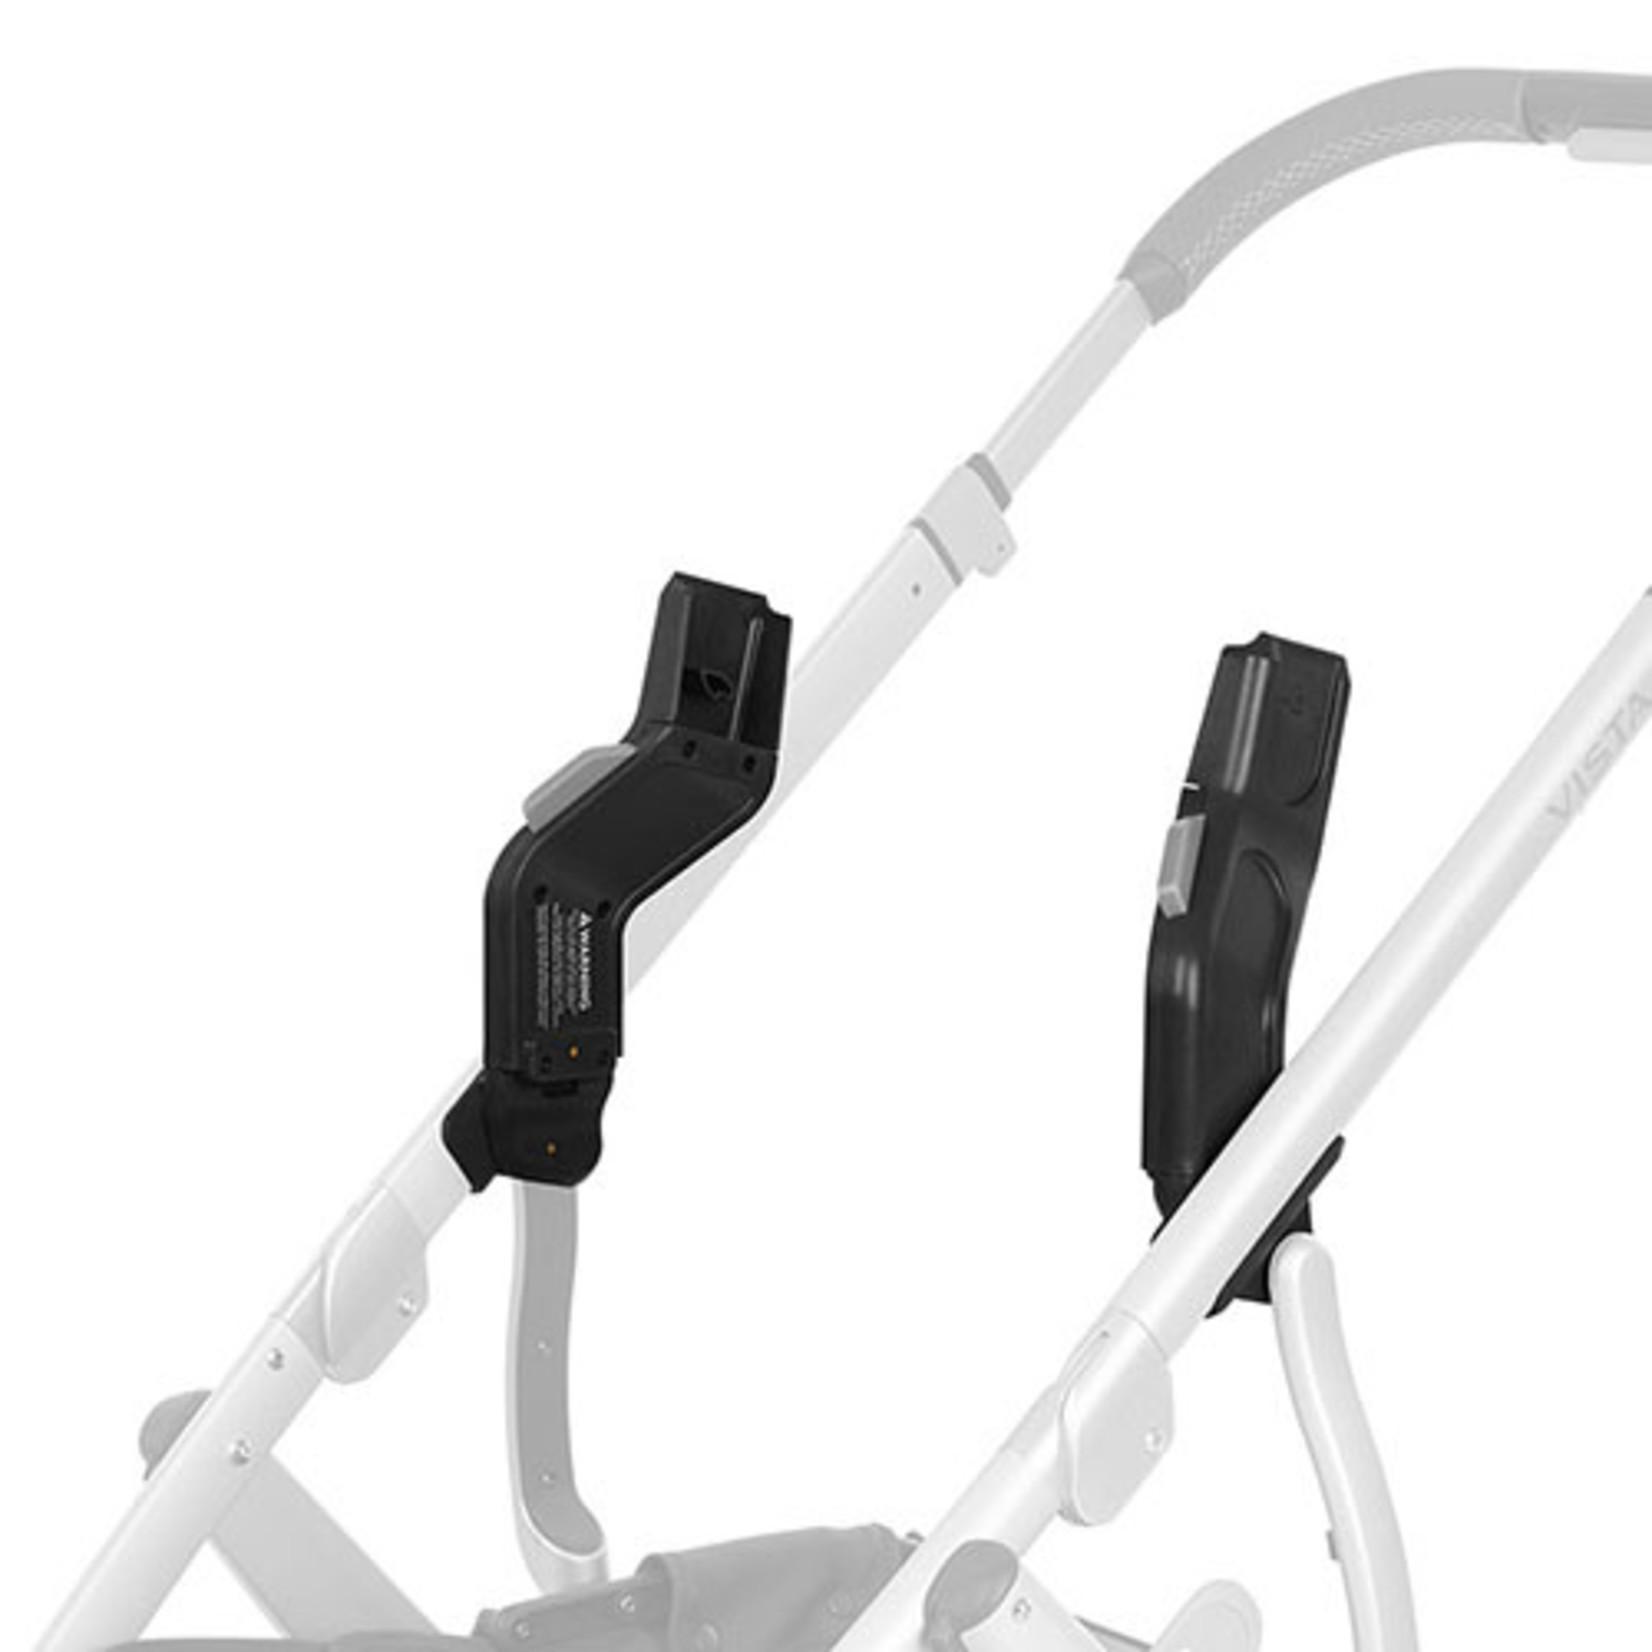 UPPAbaby Car Seat Adapters (Maxi-Cosi, Nuna, Cybex, and BeSafe)